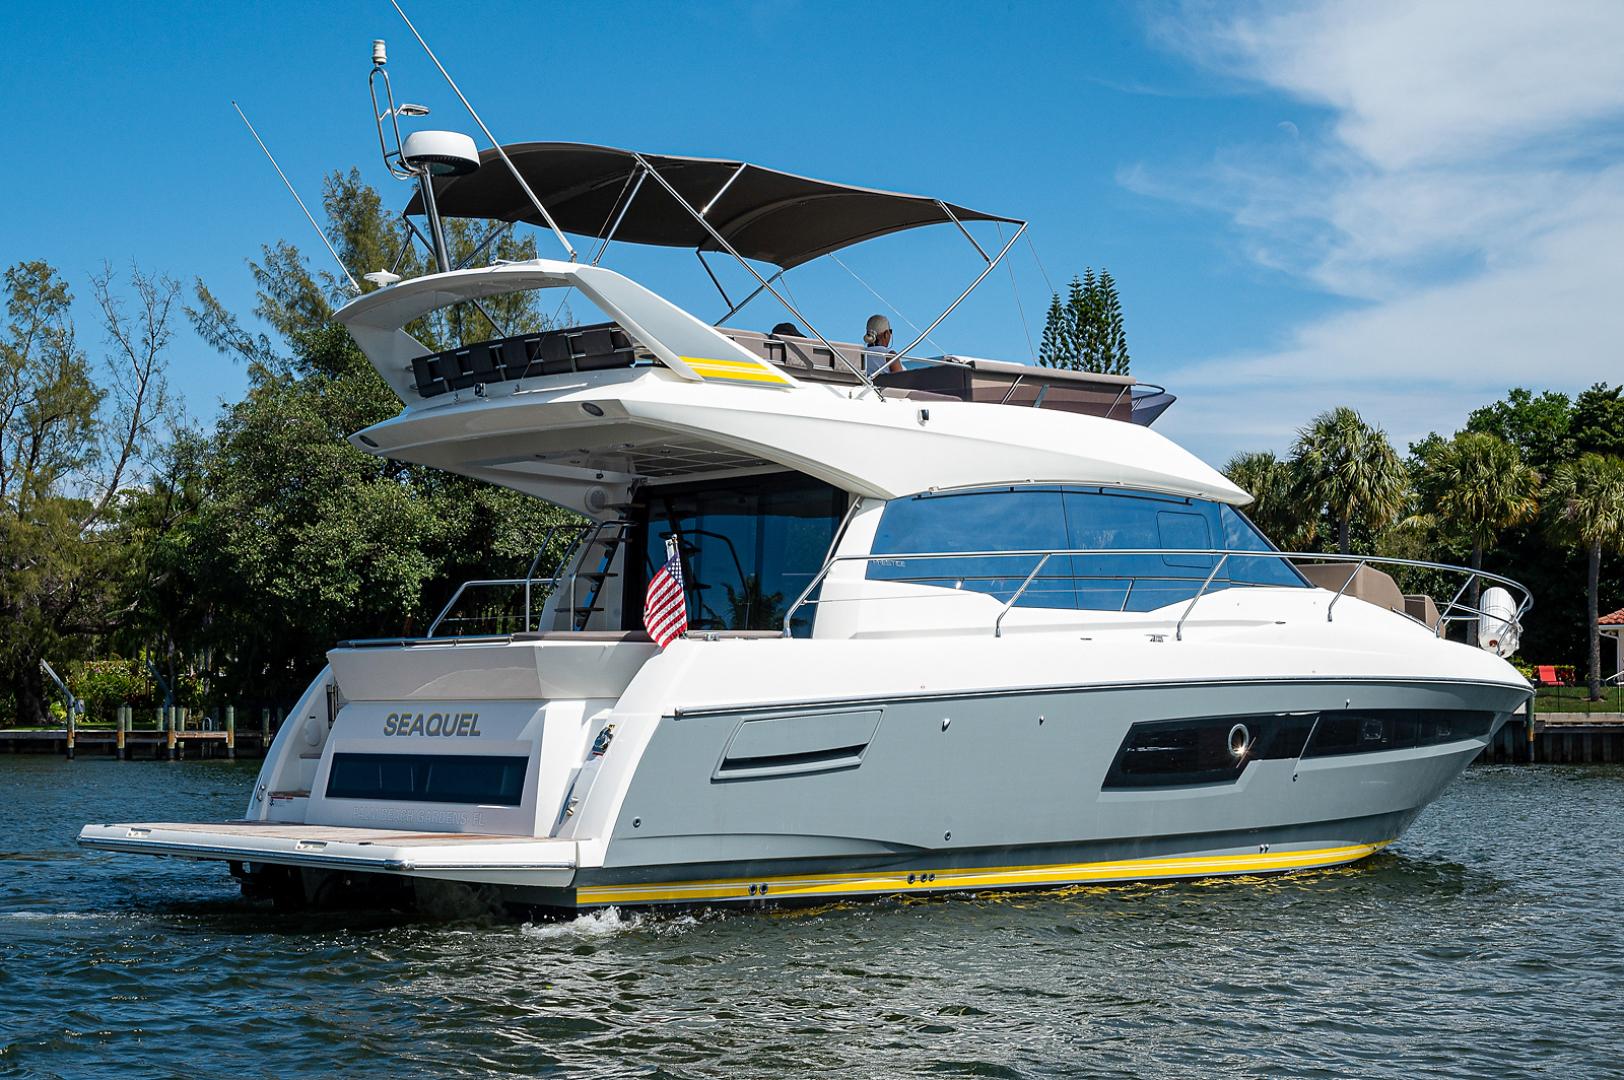 Prestige-460 Flybridge 2018-SEAQUEL Palm Beach Gardens-Florida-United States-Starboard Stern-1351131 | Thumbnail